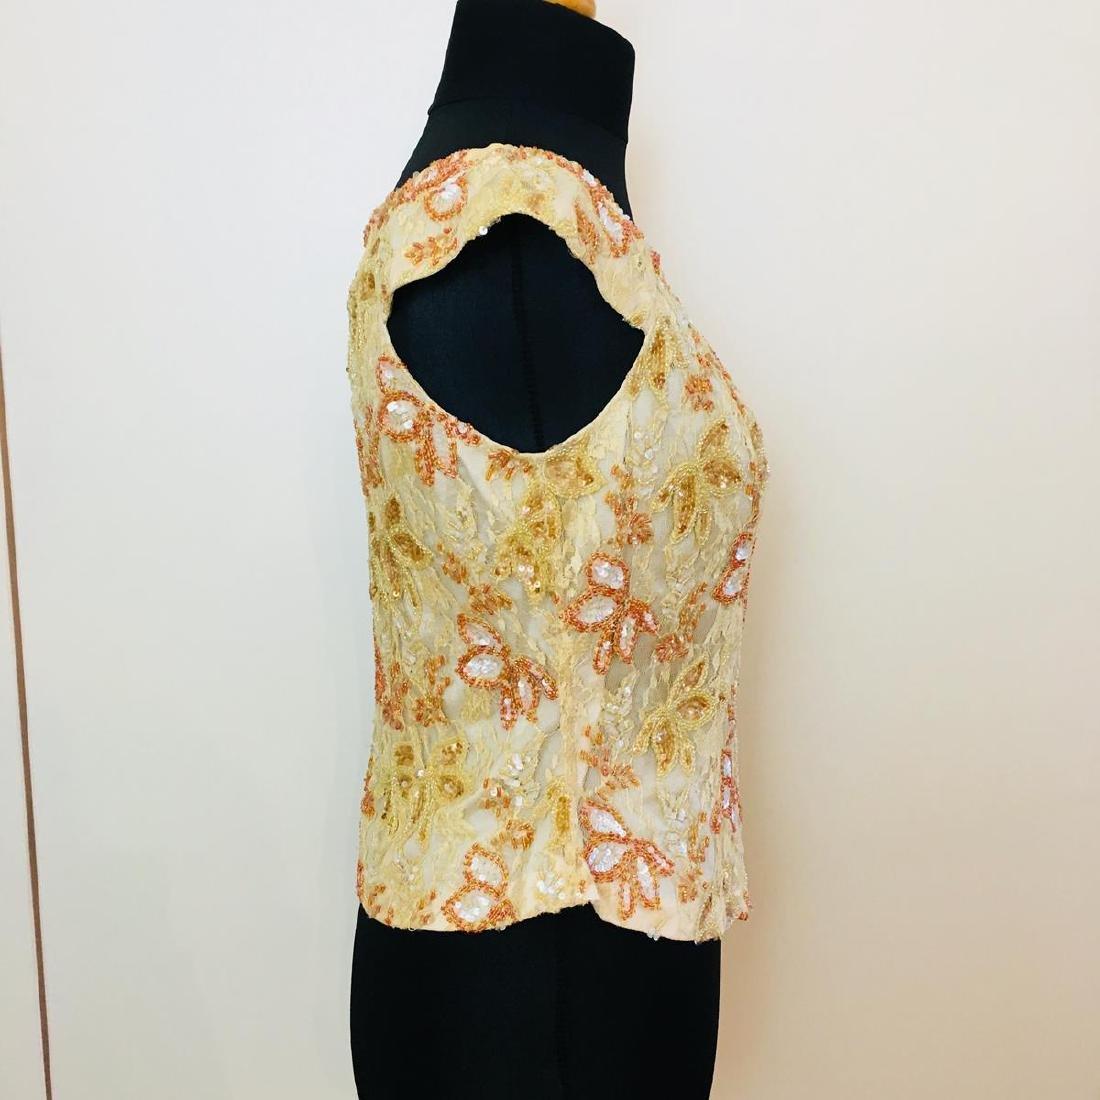 Vintage Women's Collection Designer Blouse Shirt Top - 4